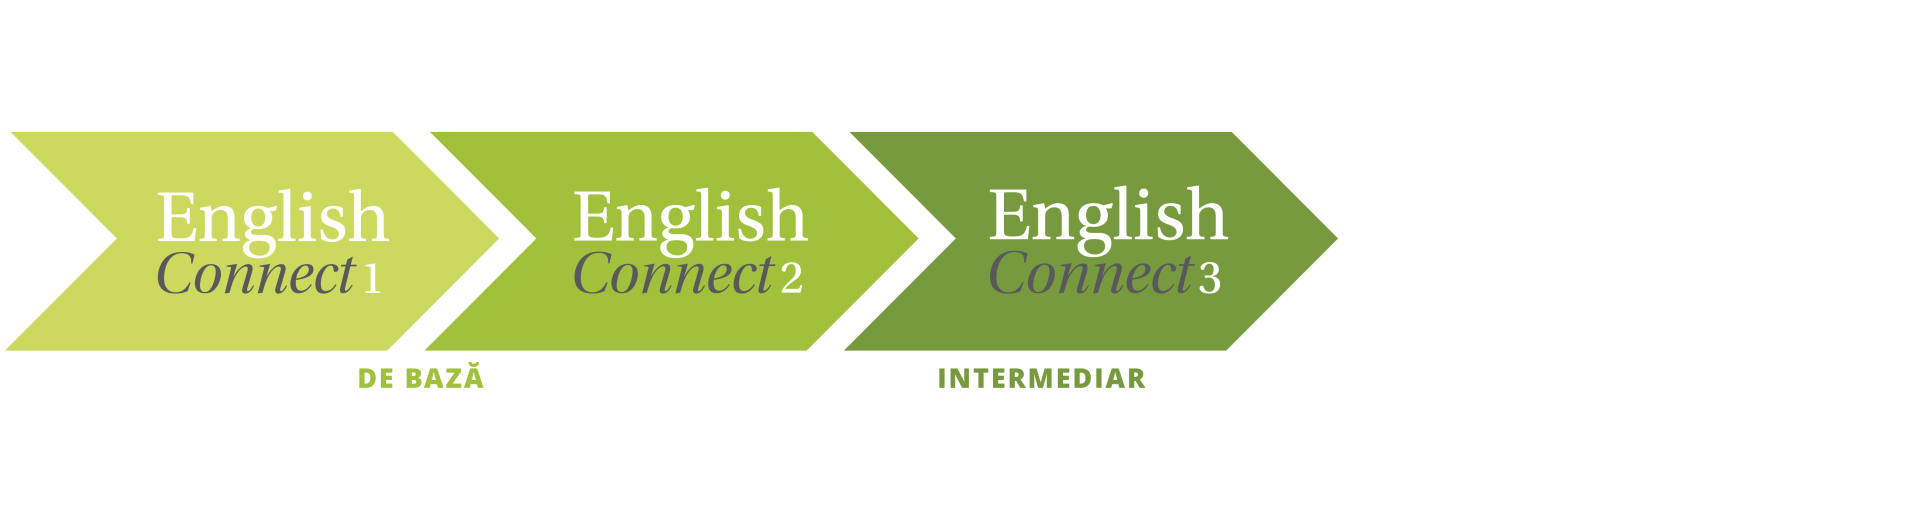 icon indicând EnglishConnect Chevron